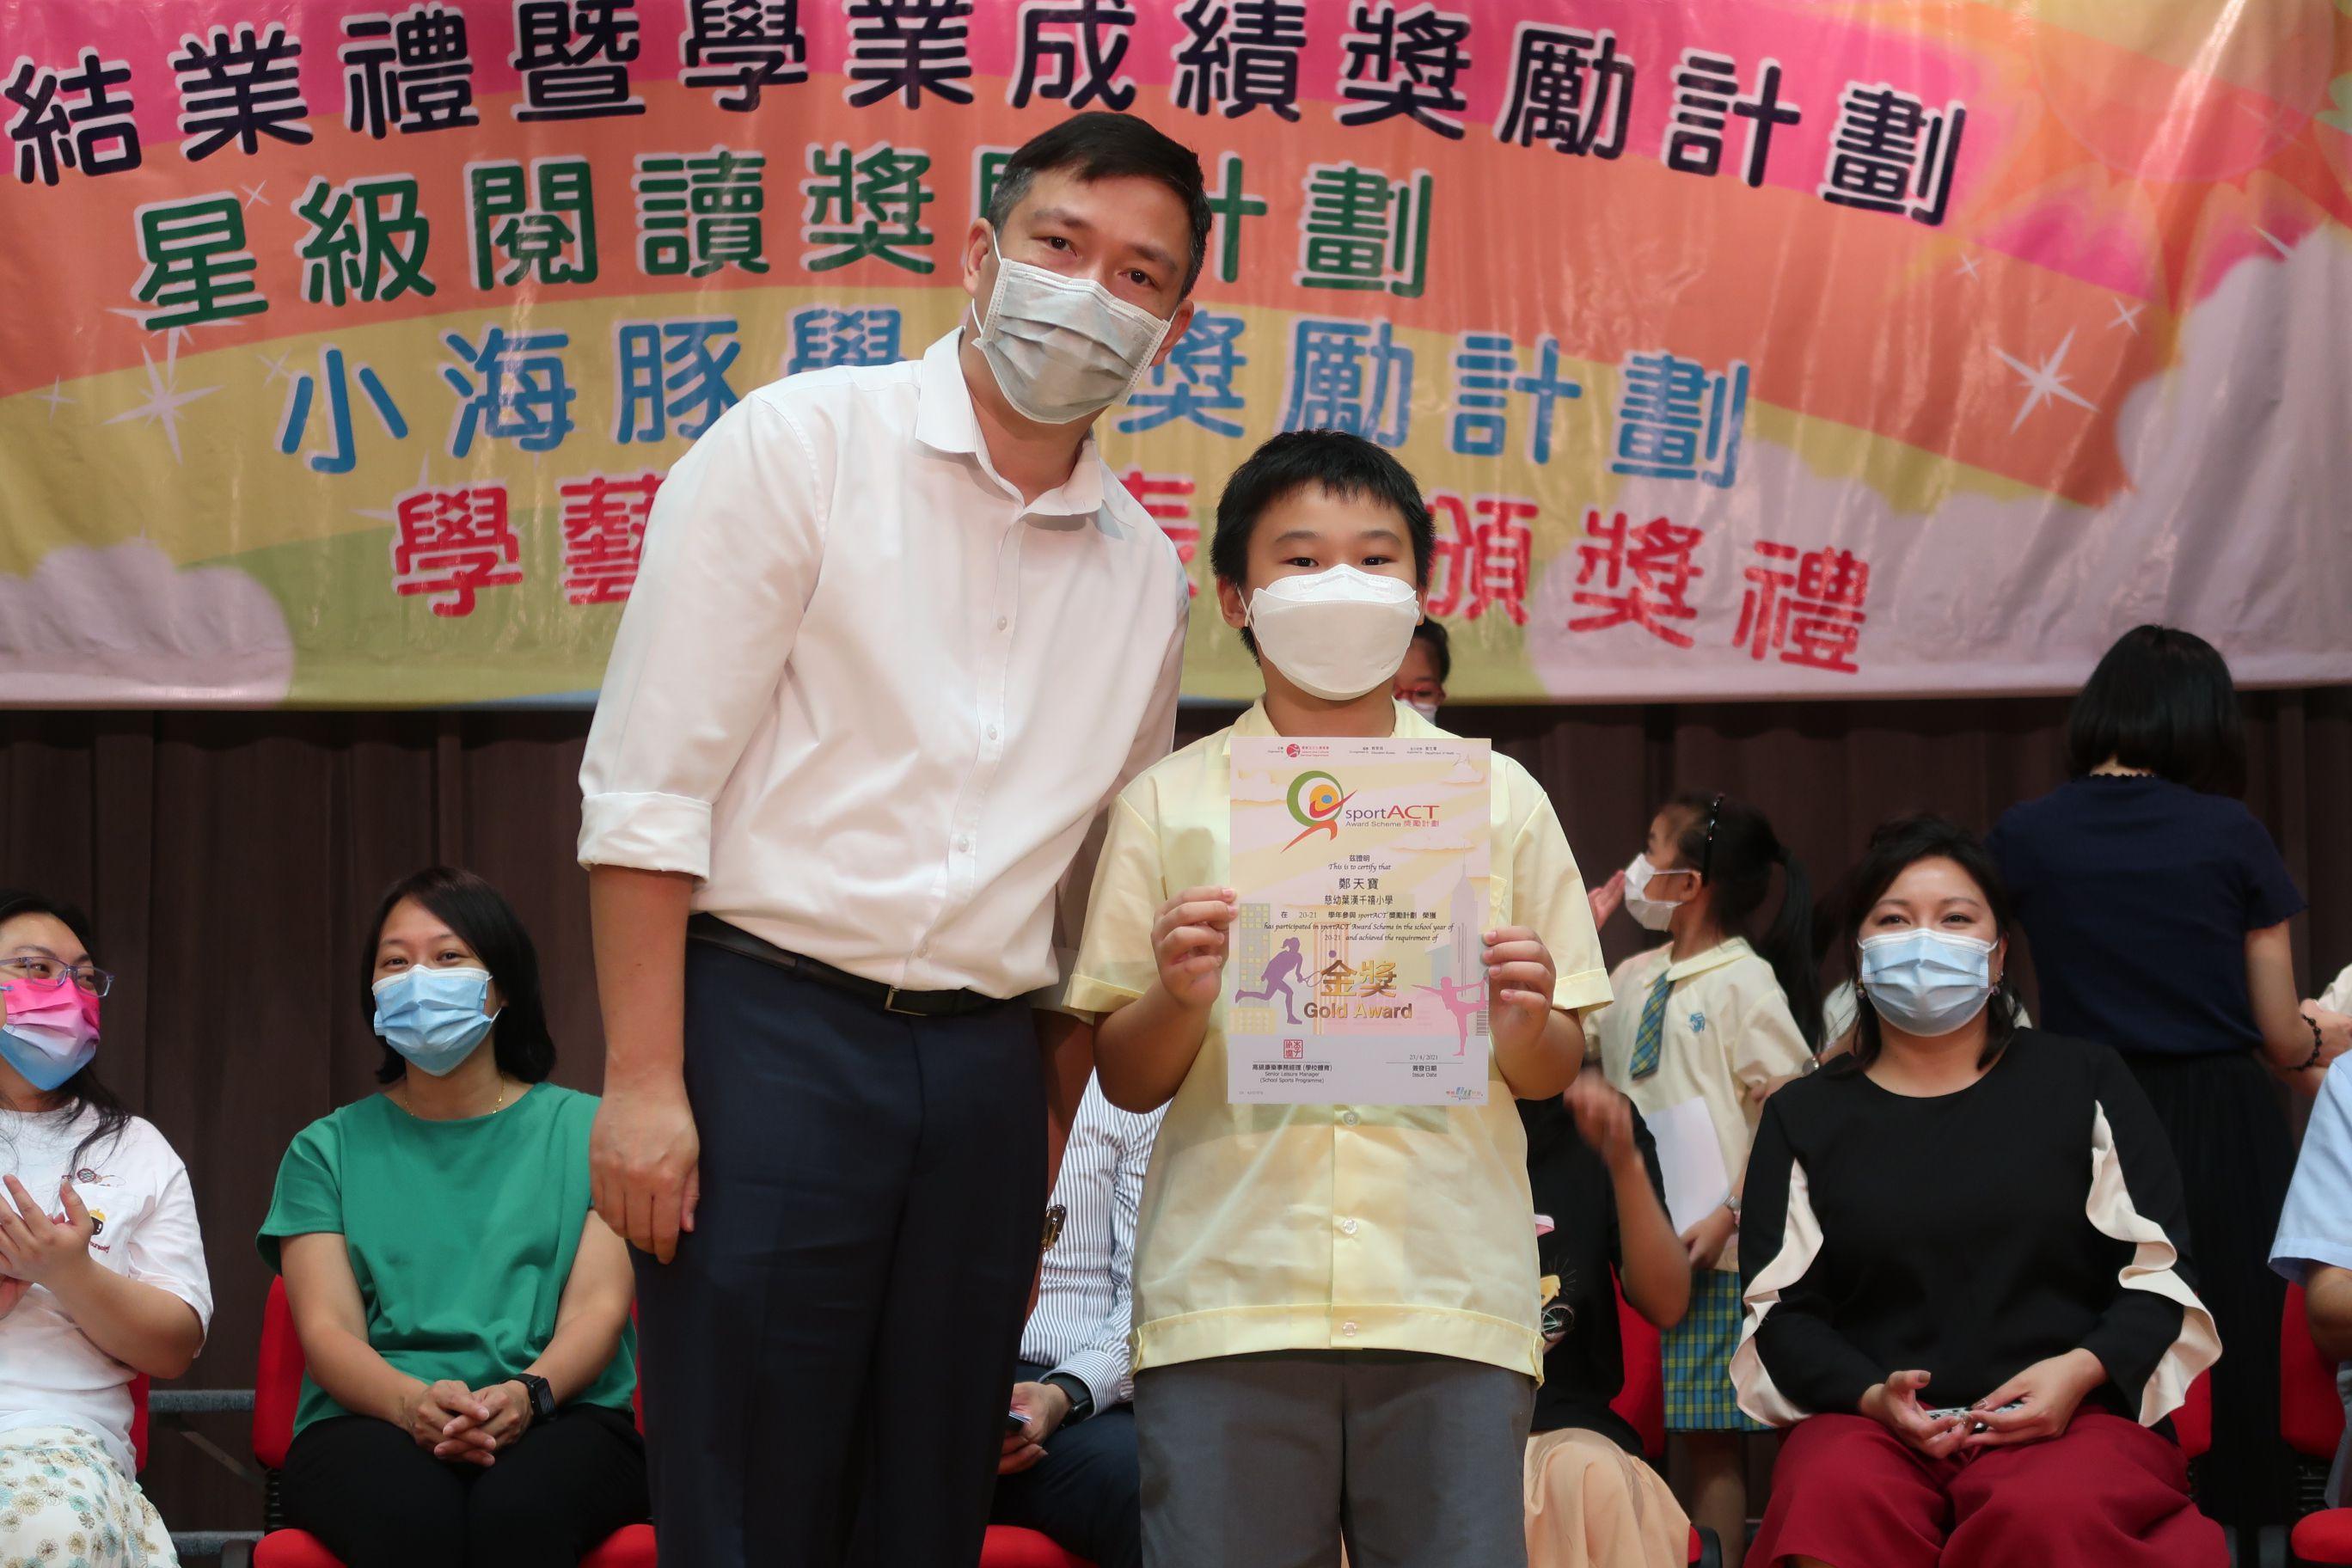 https://syh.edu.hk/sites/default/files/img_5900.jpg